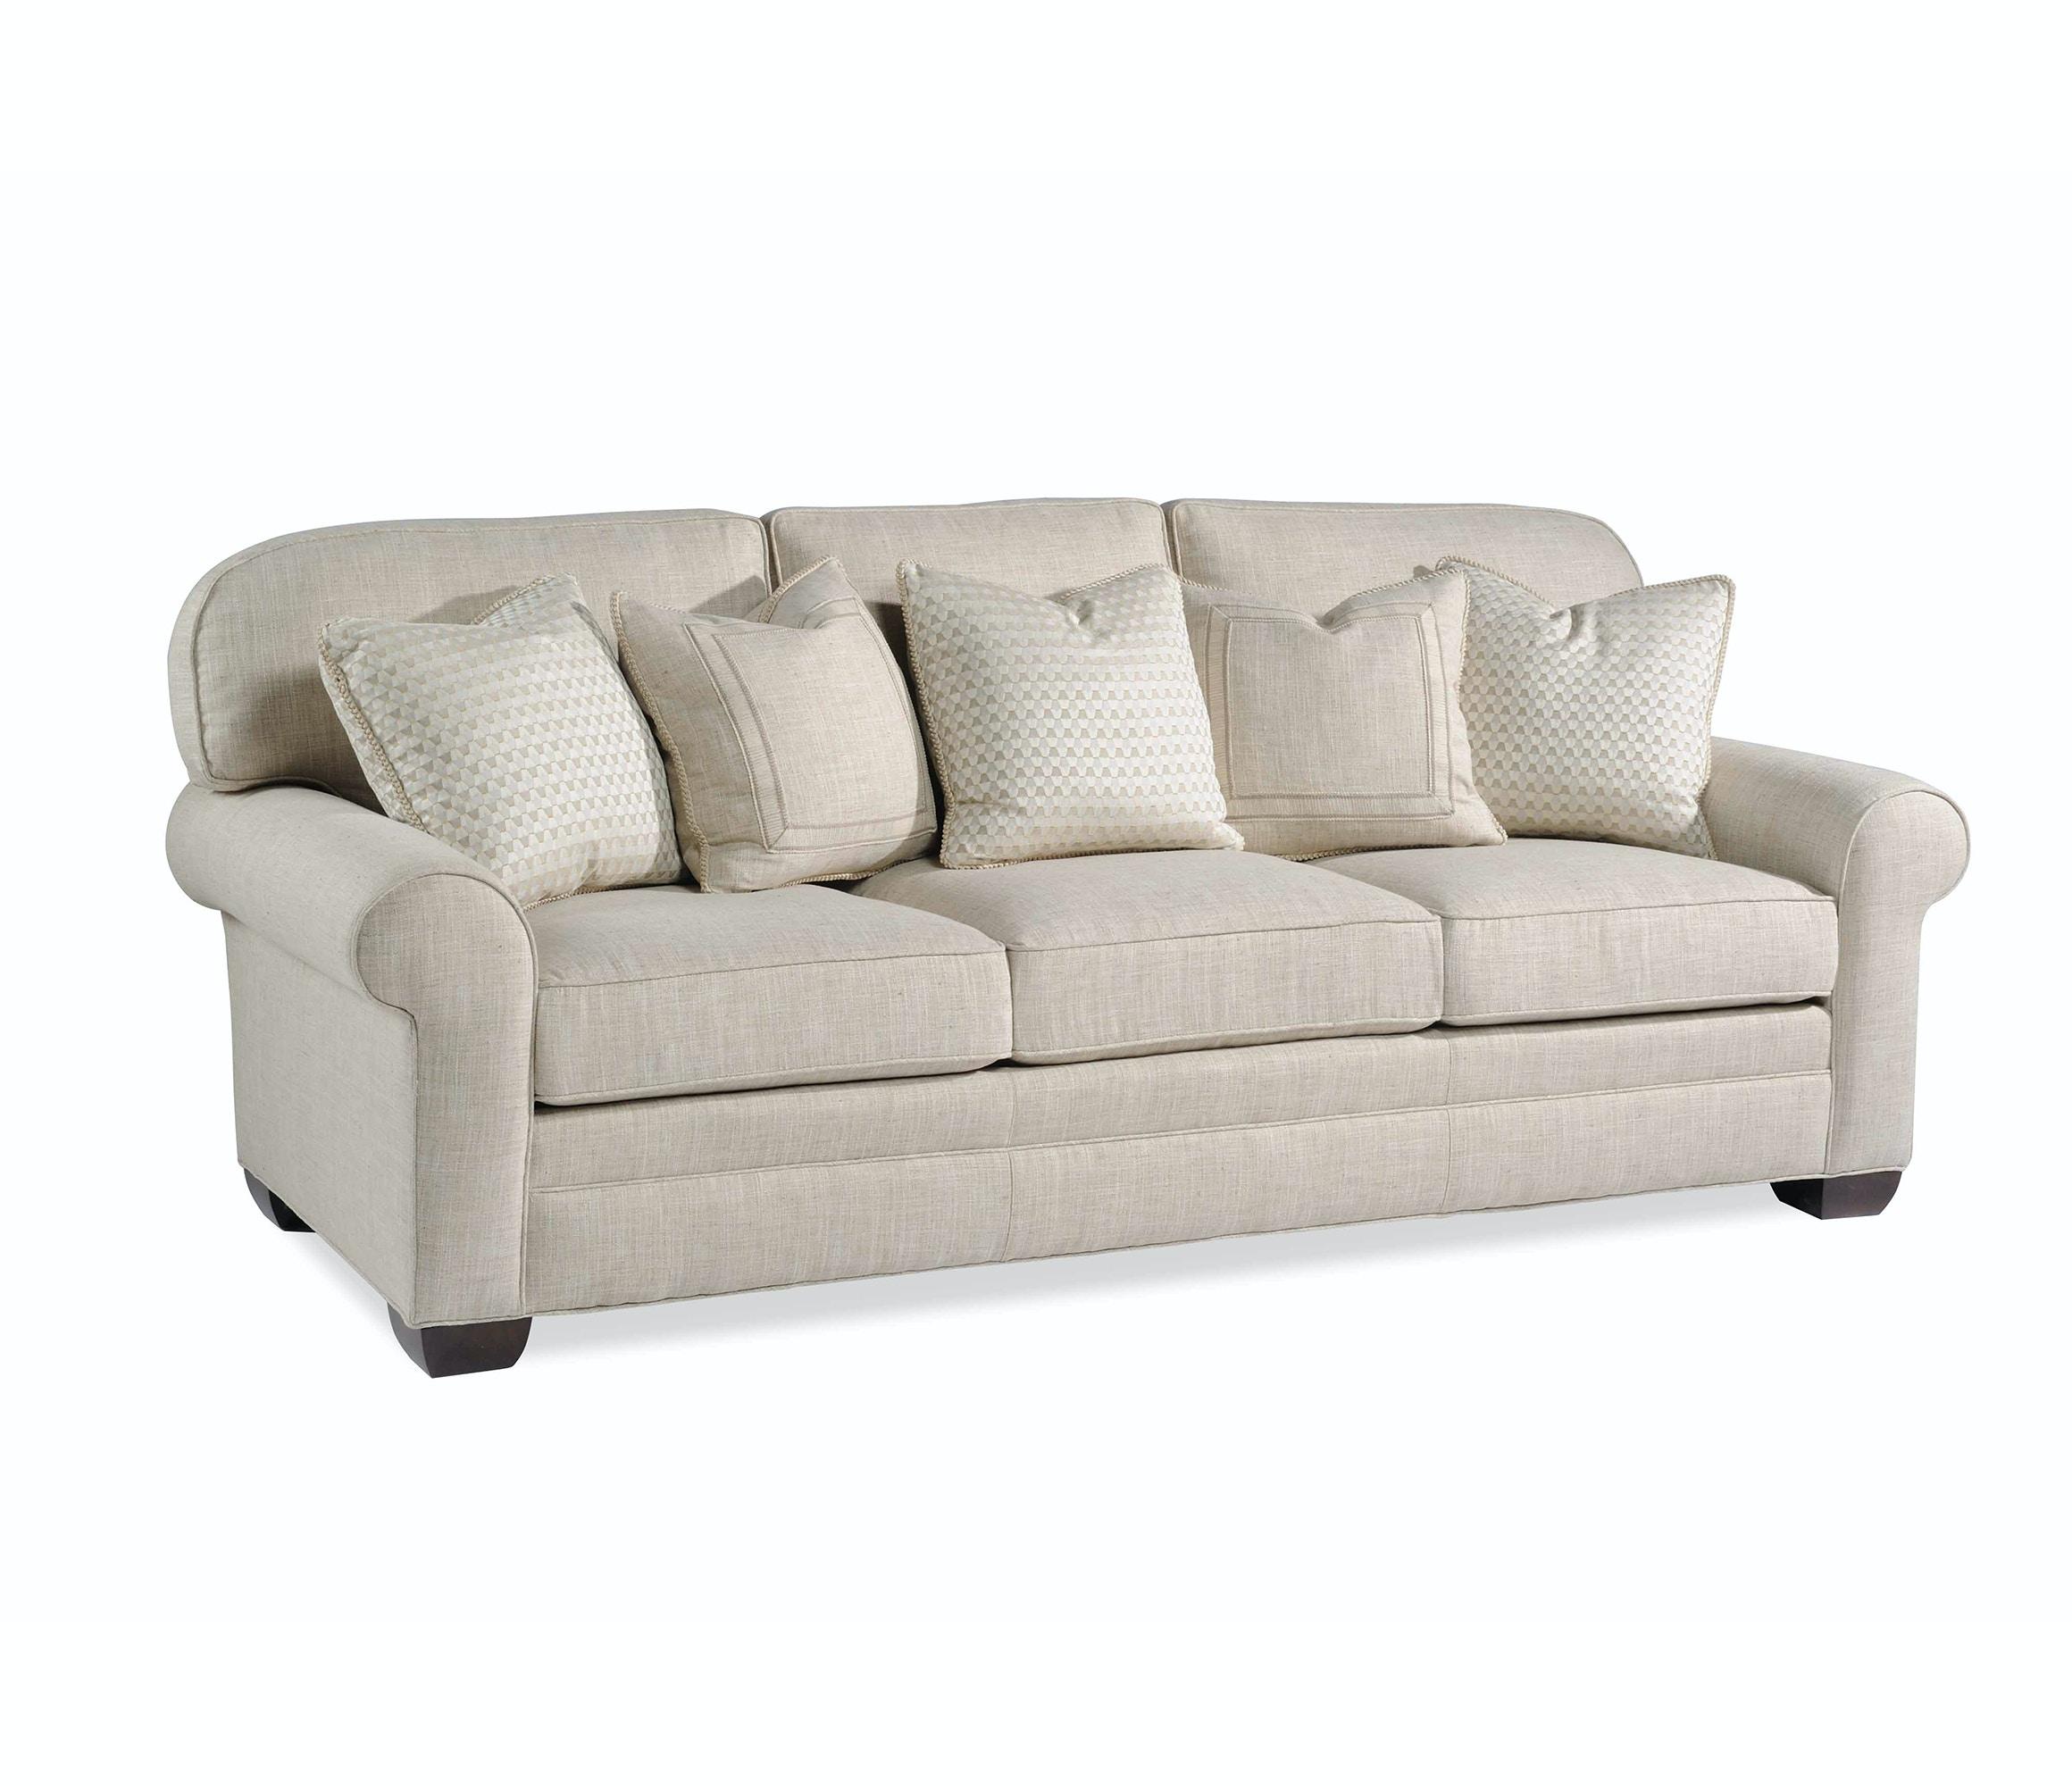 Taylor King Furniture Taylor Made Continental Sofa C4592 98